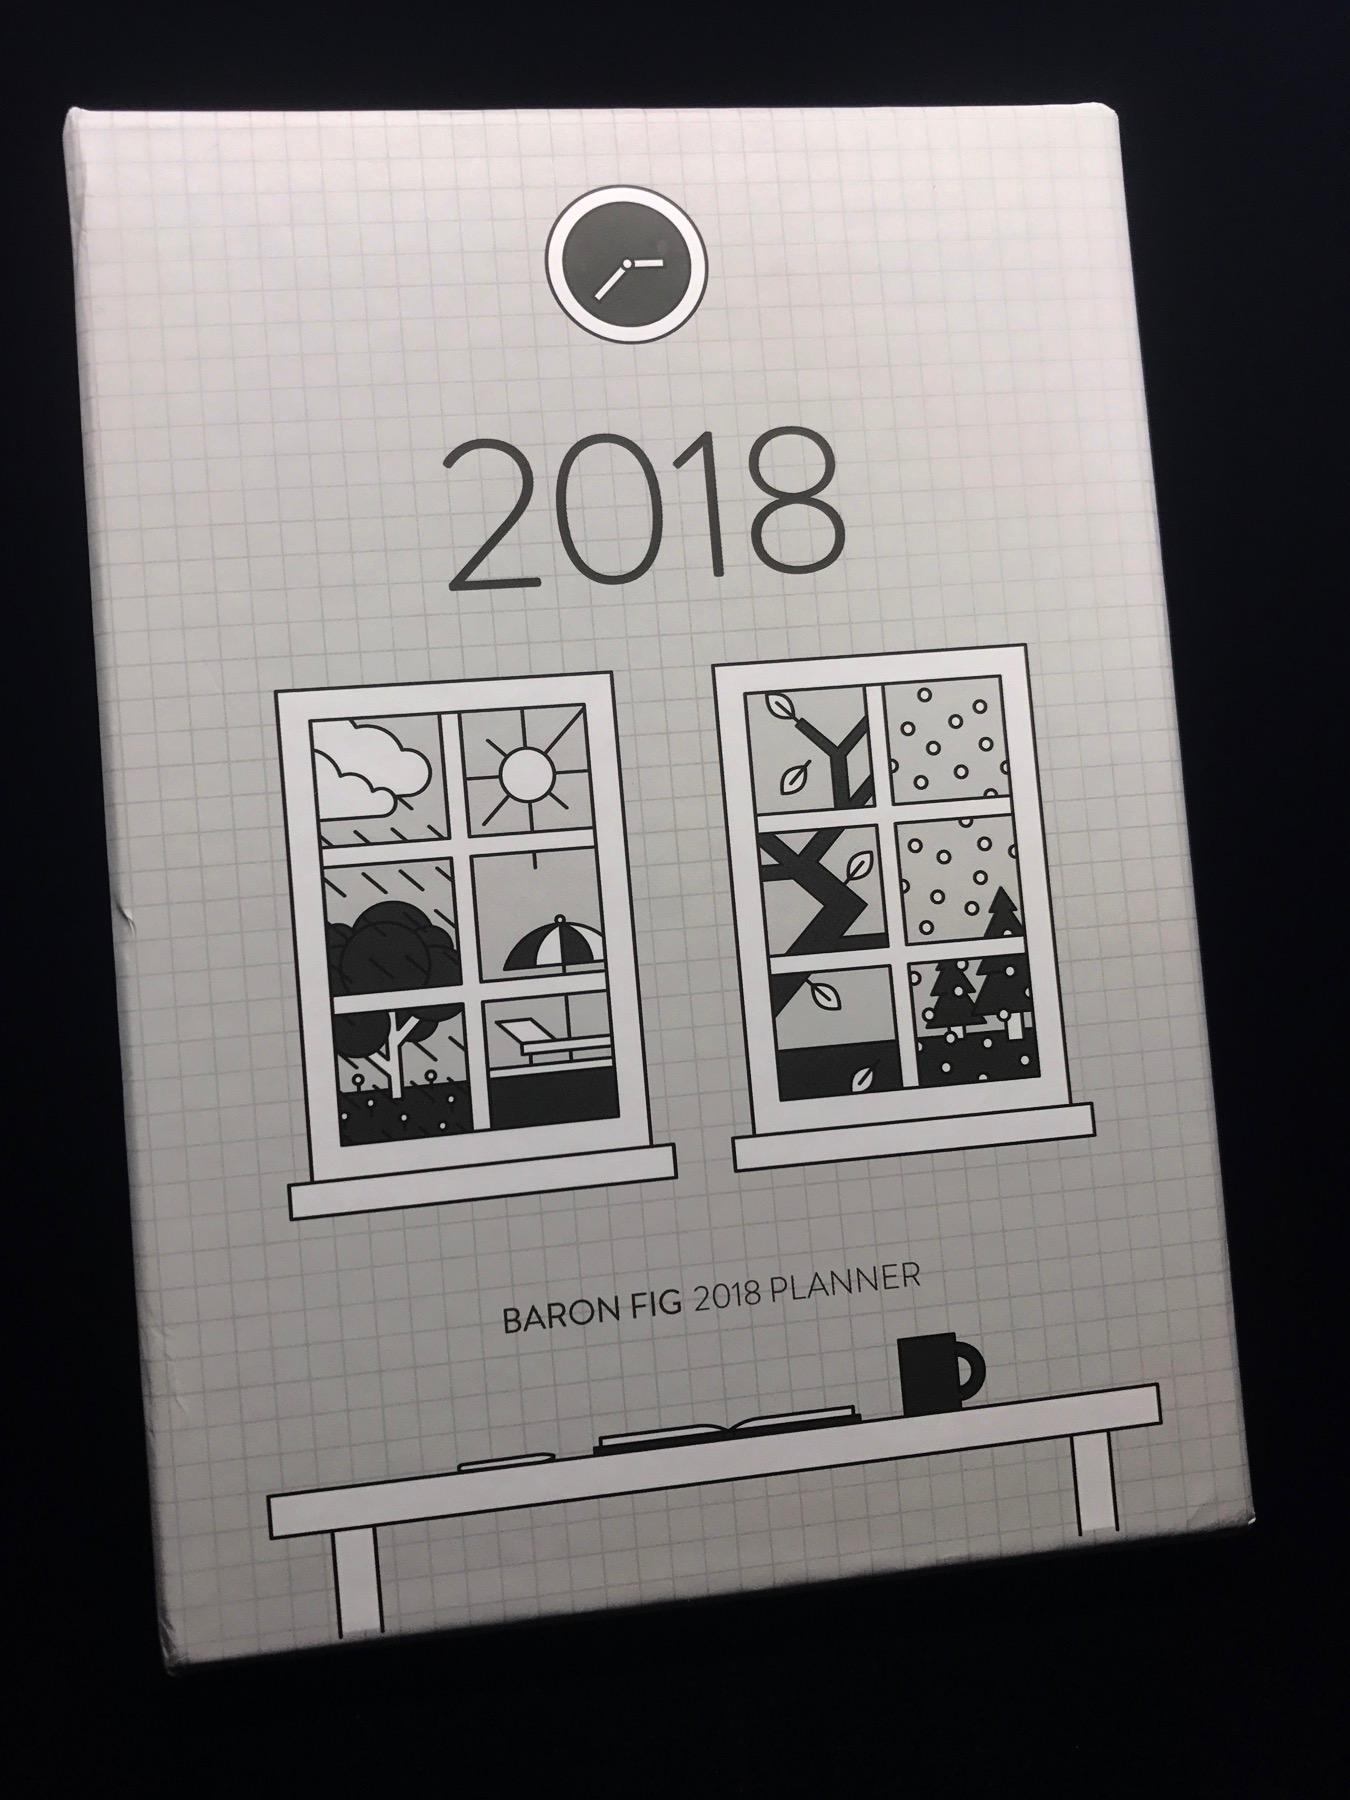 baron-fig-confidant-planner-14.jpg